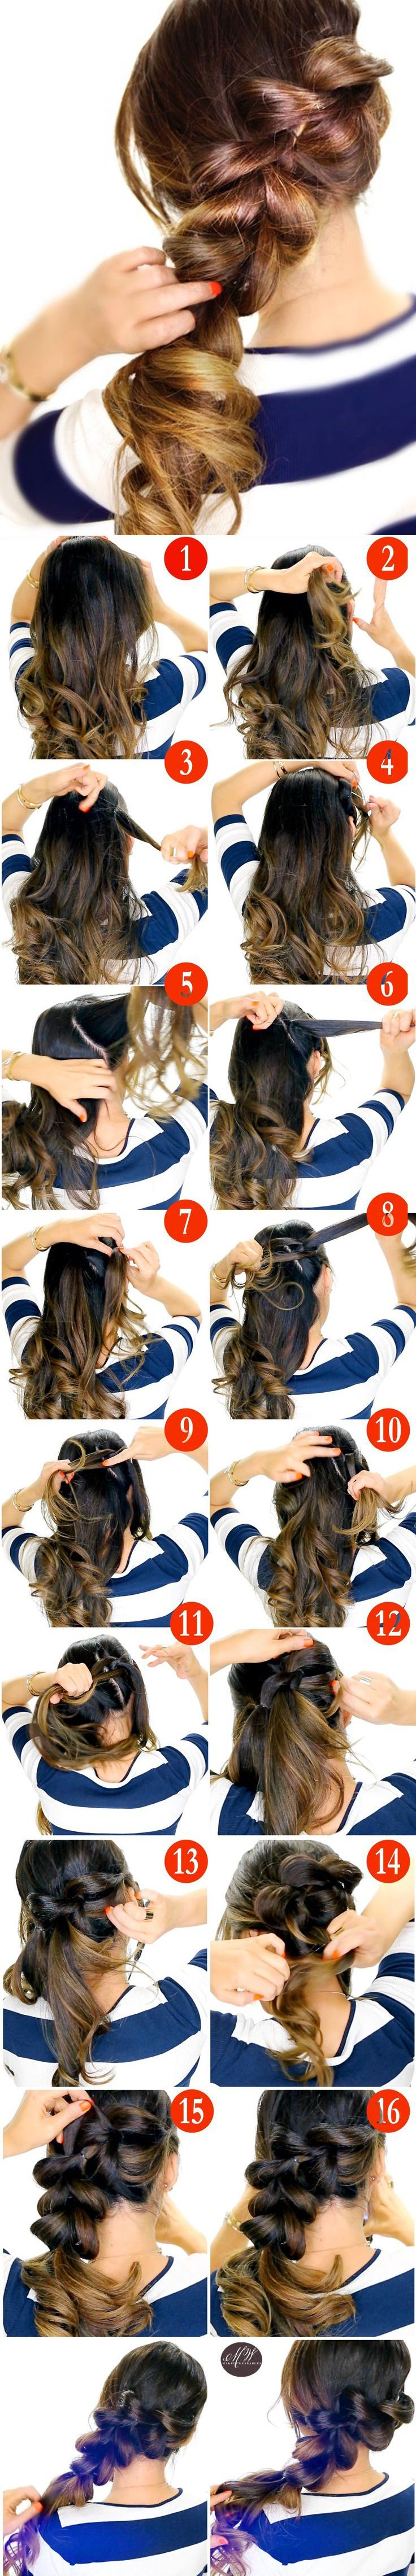 How to pony braid pull through braid haar pinterest pony